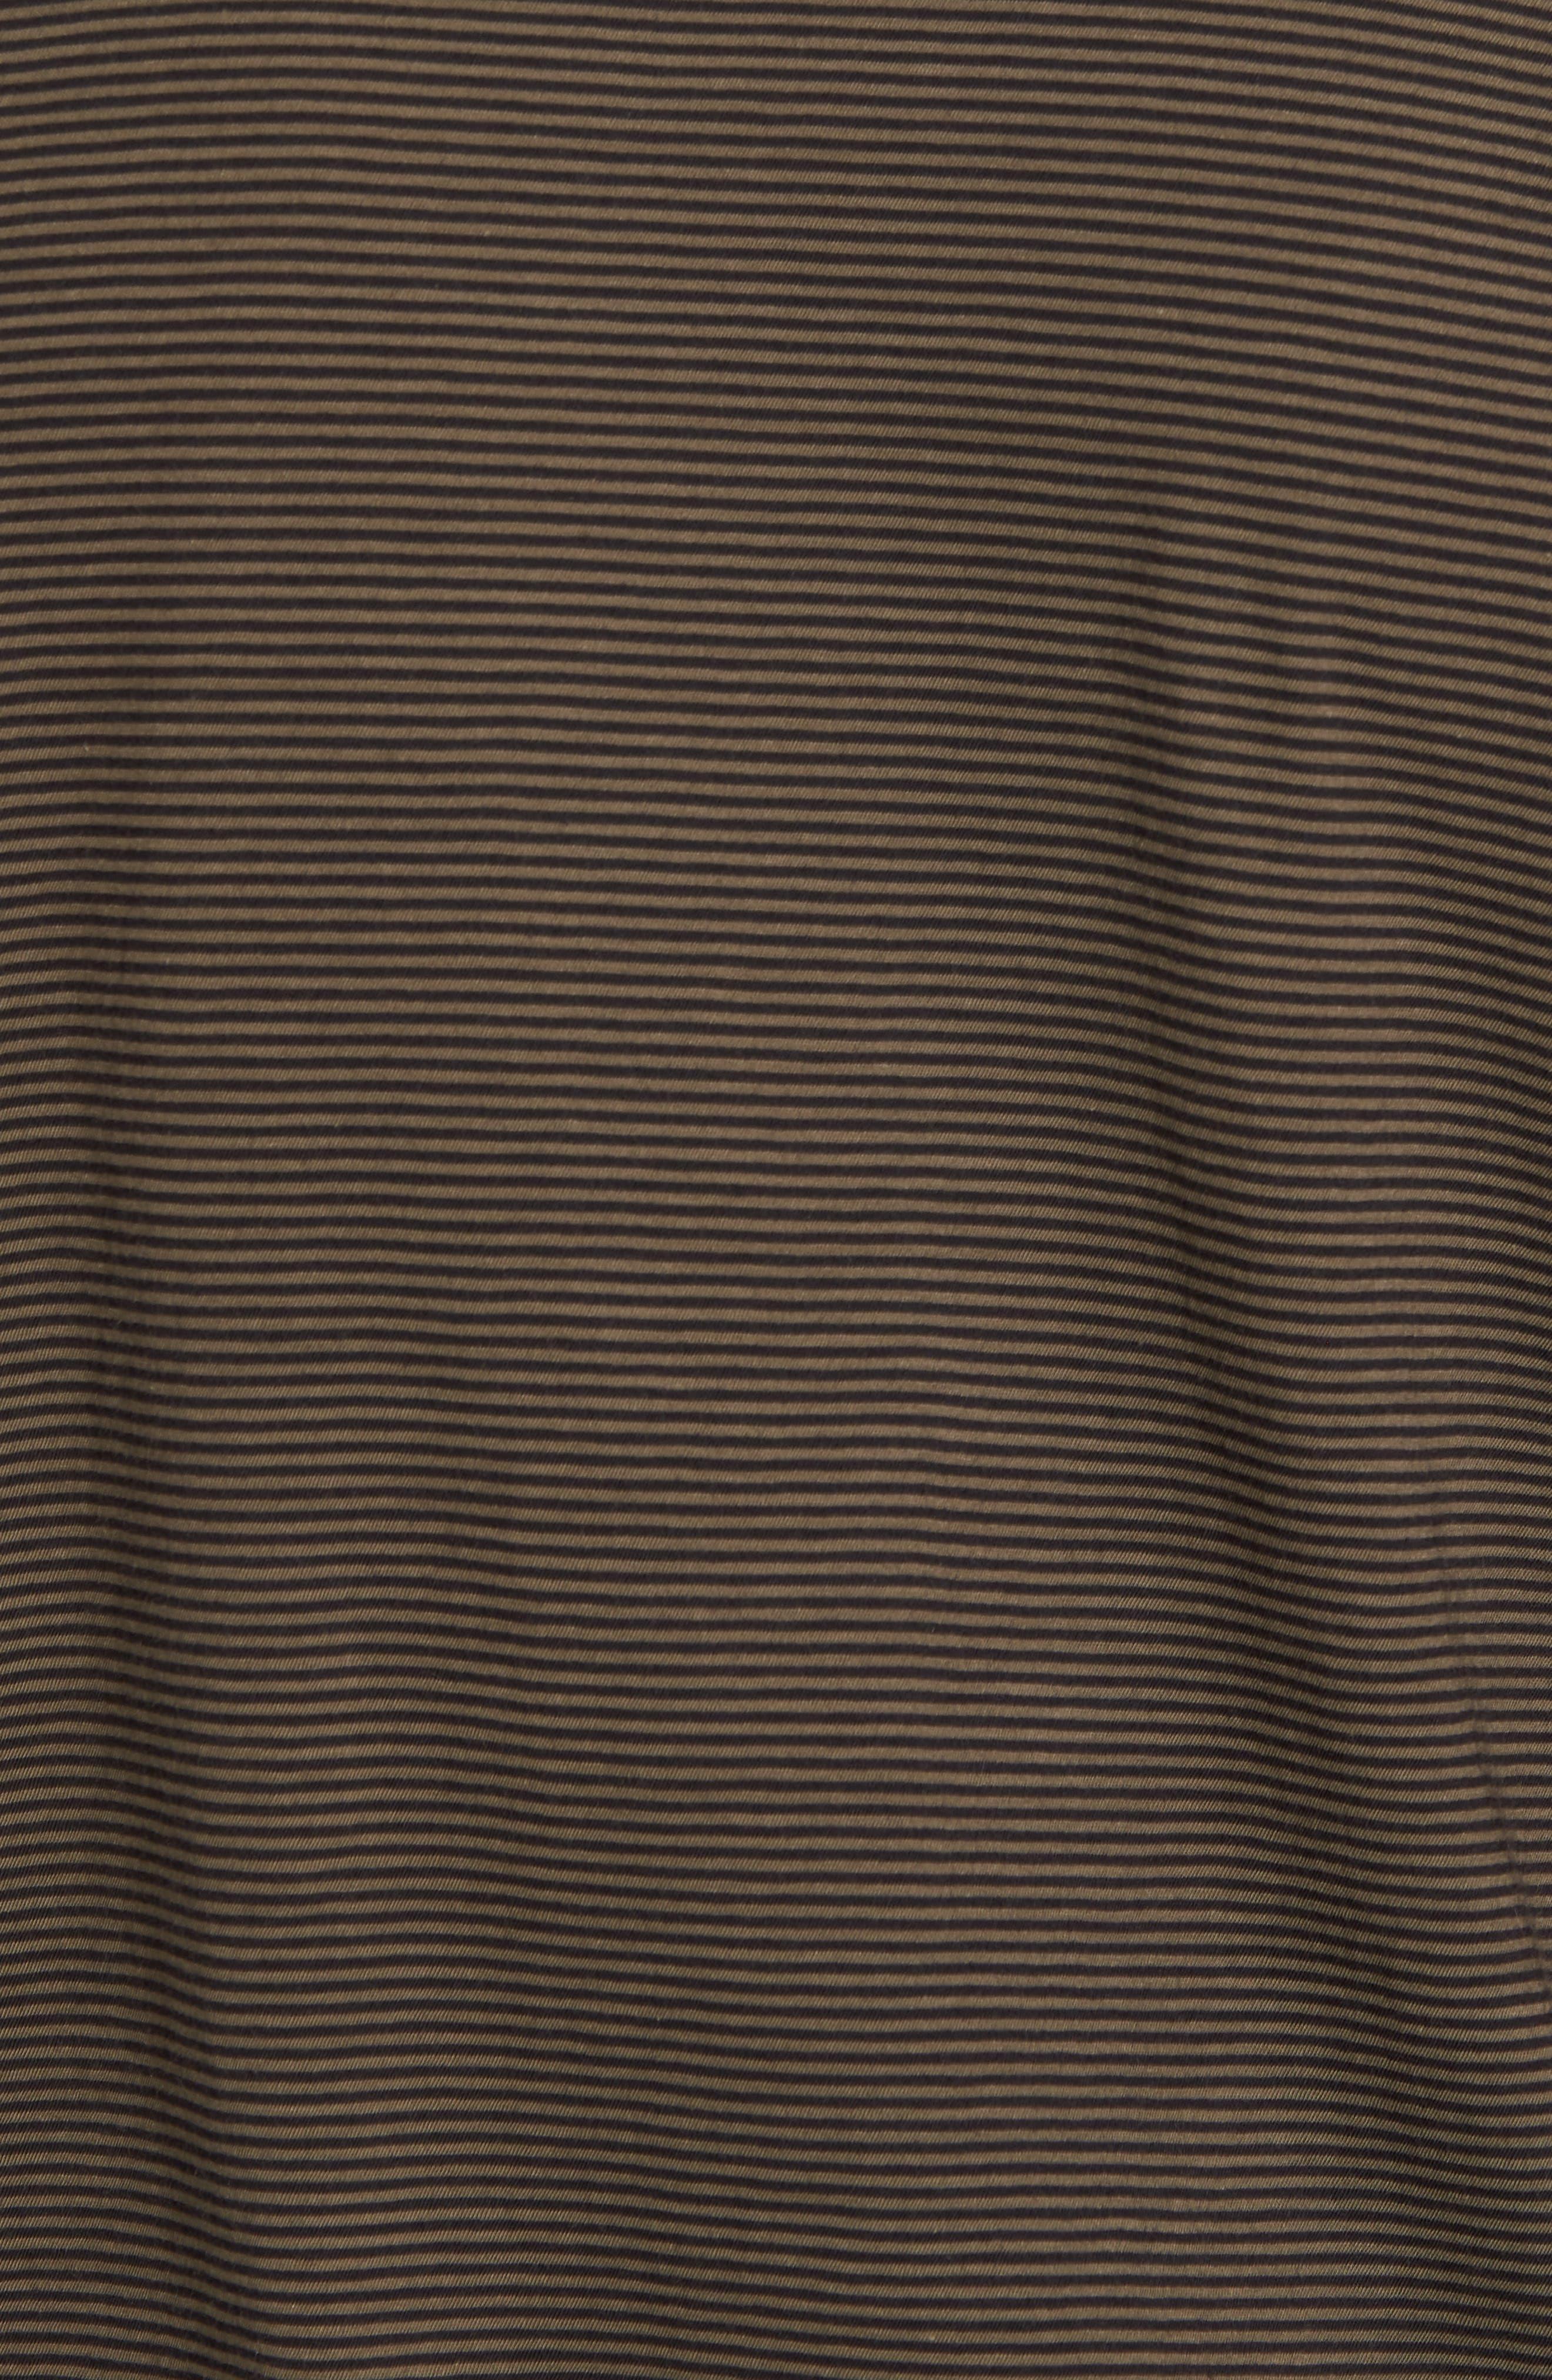 Slim Fit Stripe Pocket T-Shirt,                             Alternate thumbnail 5, color,                             Black/ Camp Green